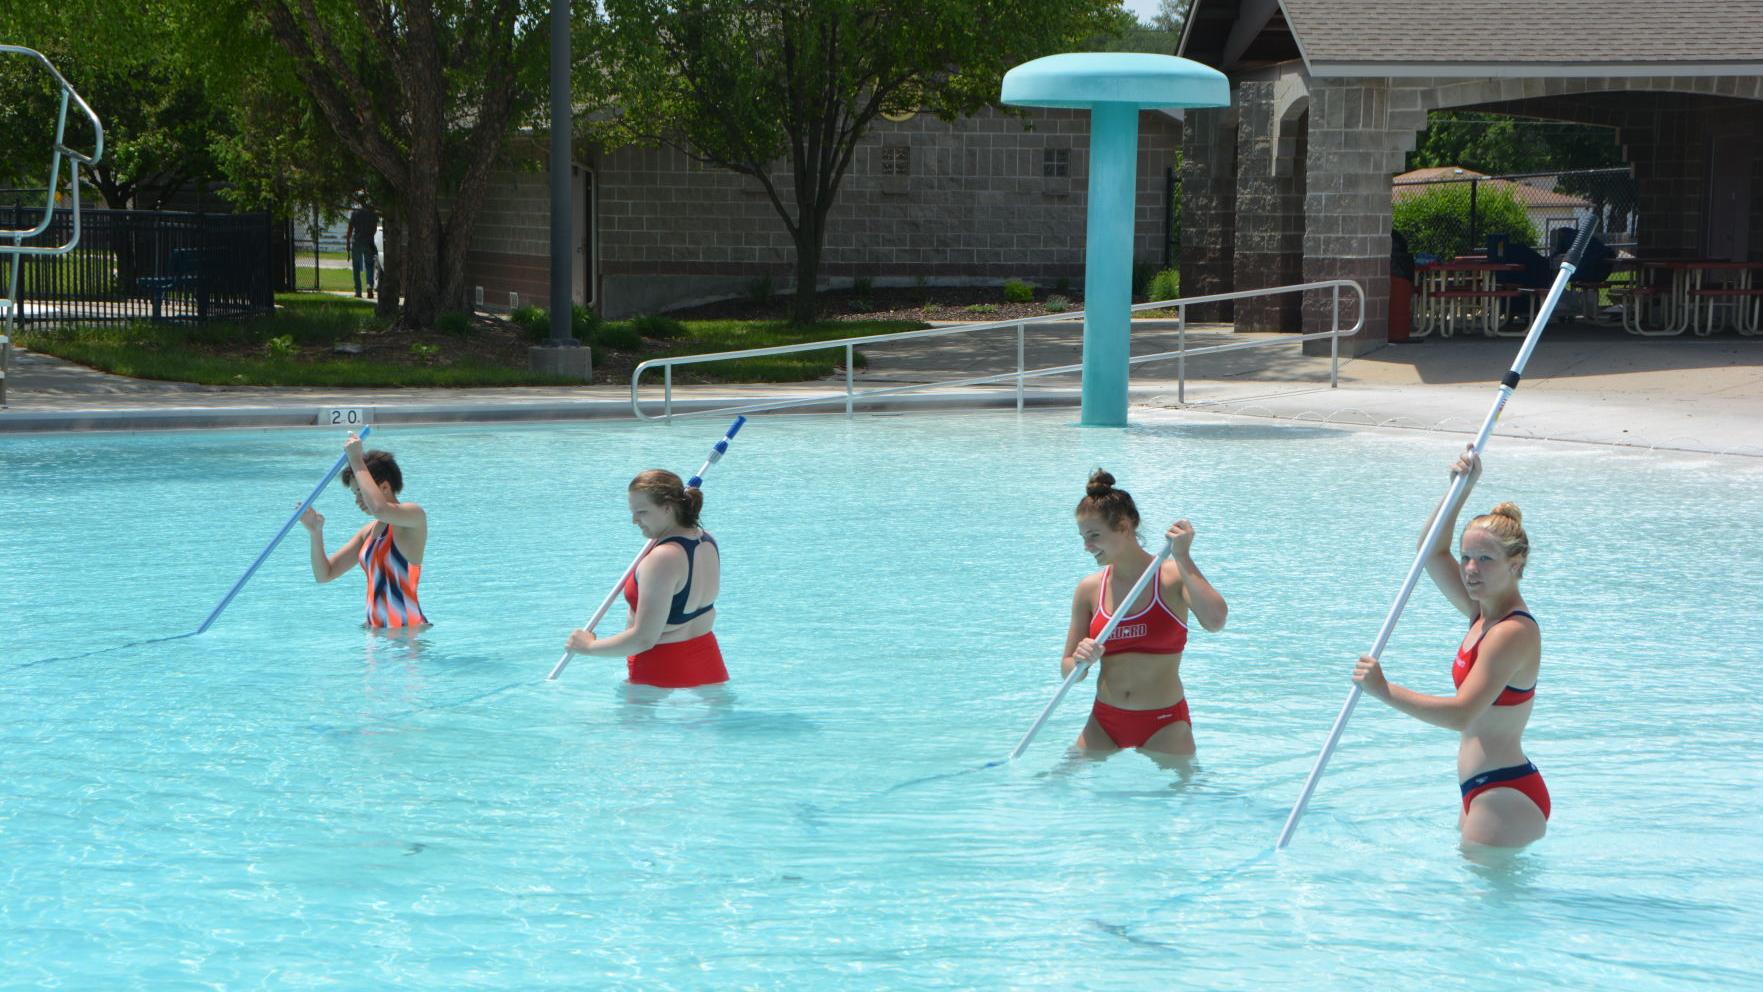 Beatrice pool opens Saturday